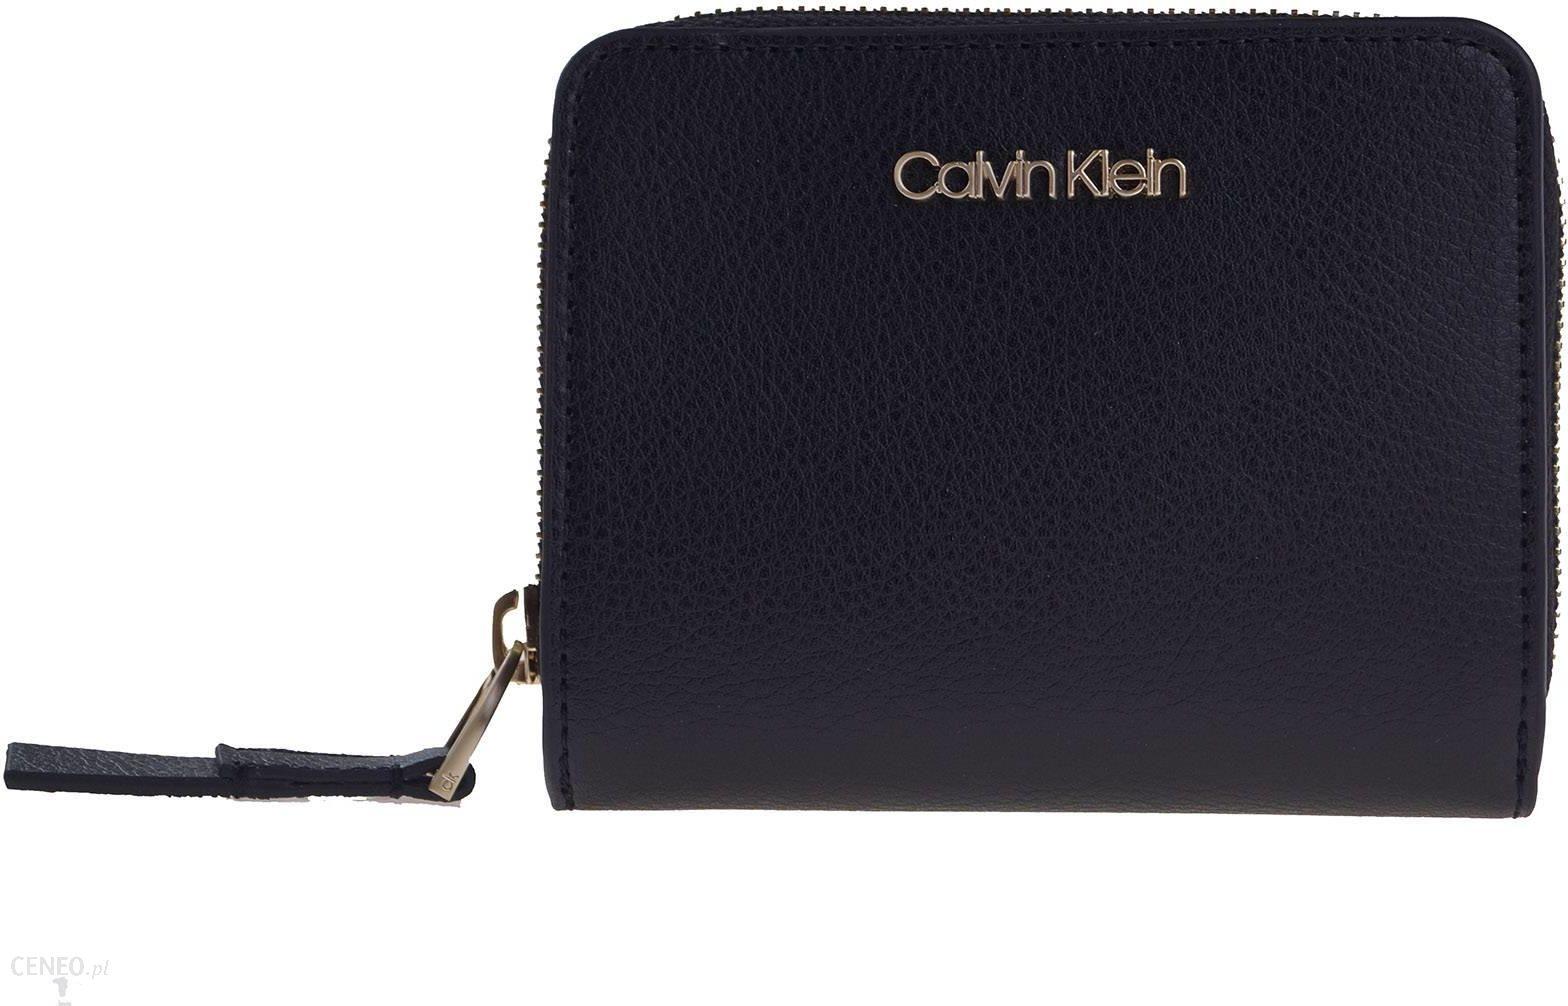 12900182311b2 Portfel Calvin Klein Frame - Ceny i opinie - Ceneo.pl